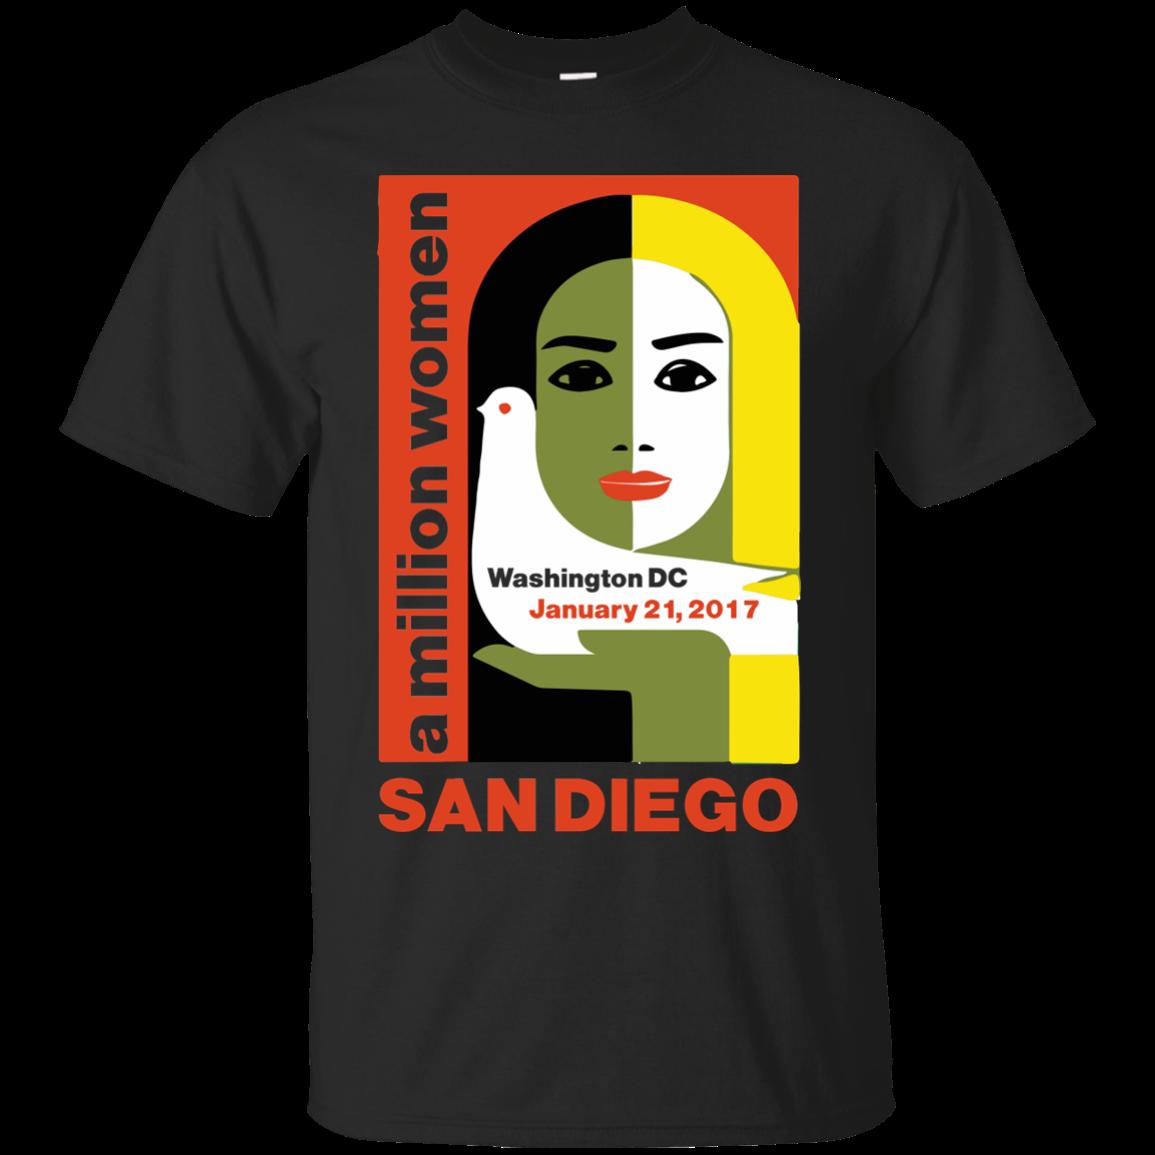 Women's March on San Diego, California January 21, 2017